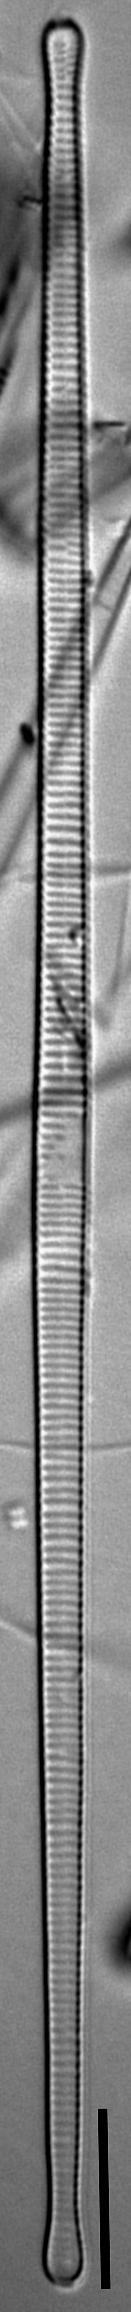 F Synegrotesca 6 125 46